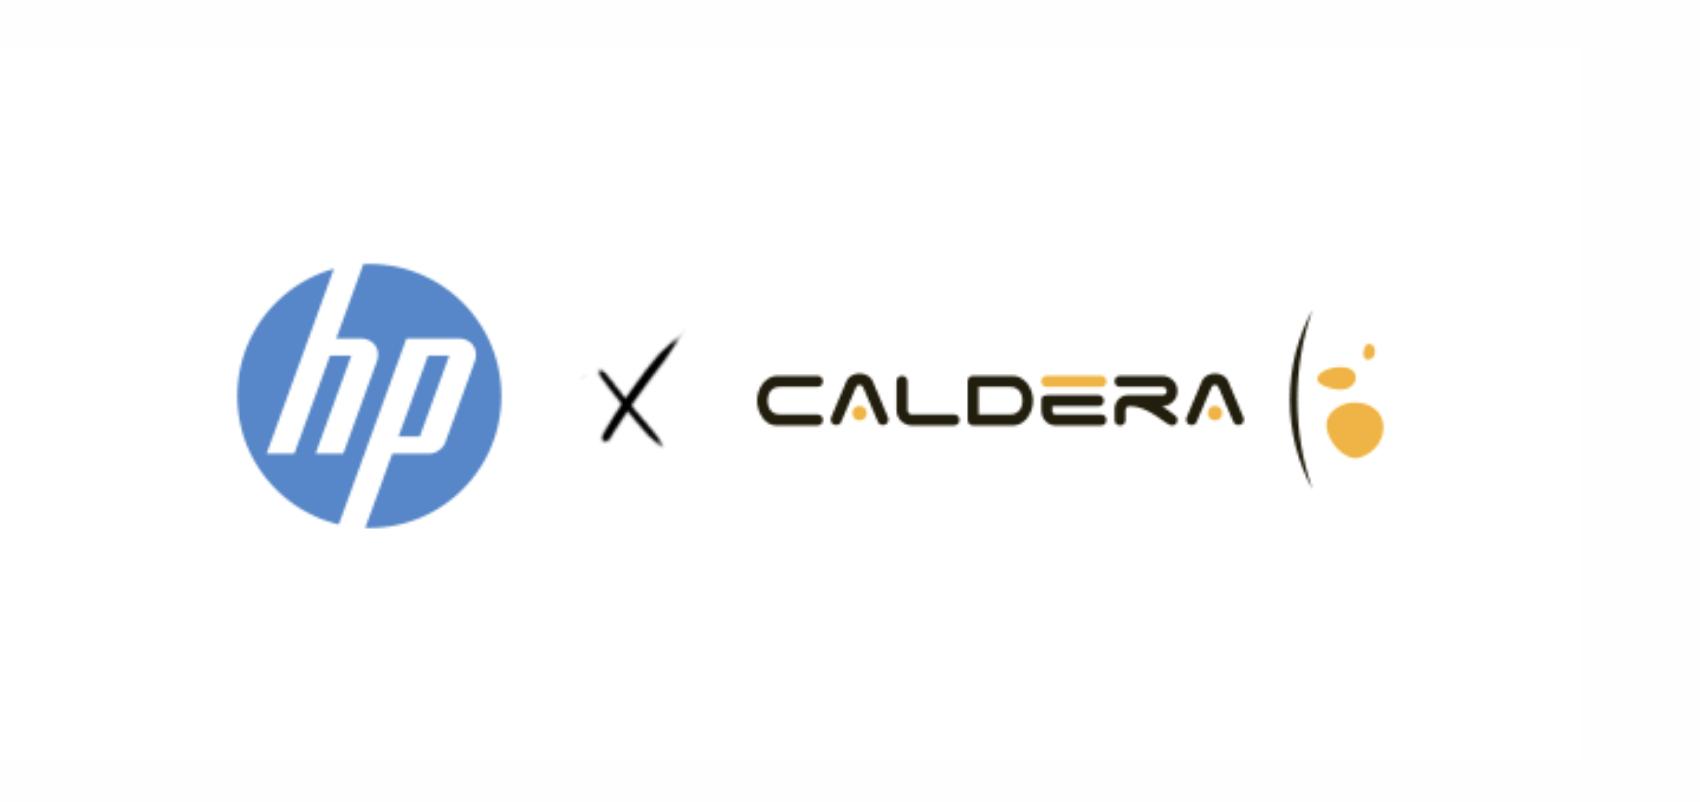 caldera logo hp logo